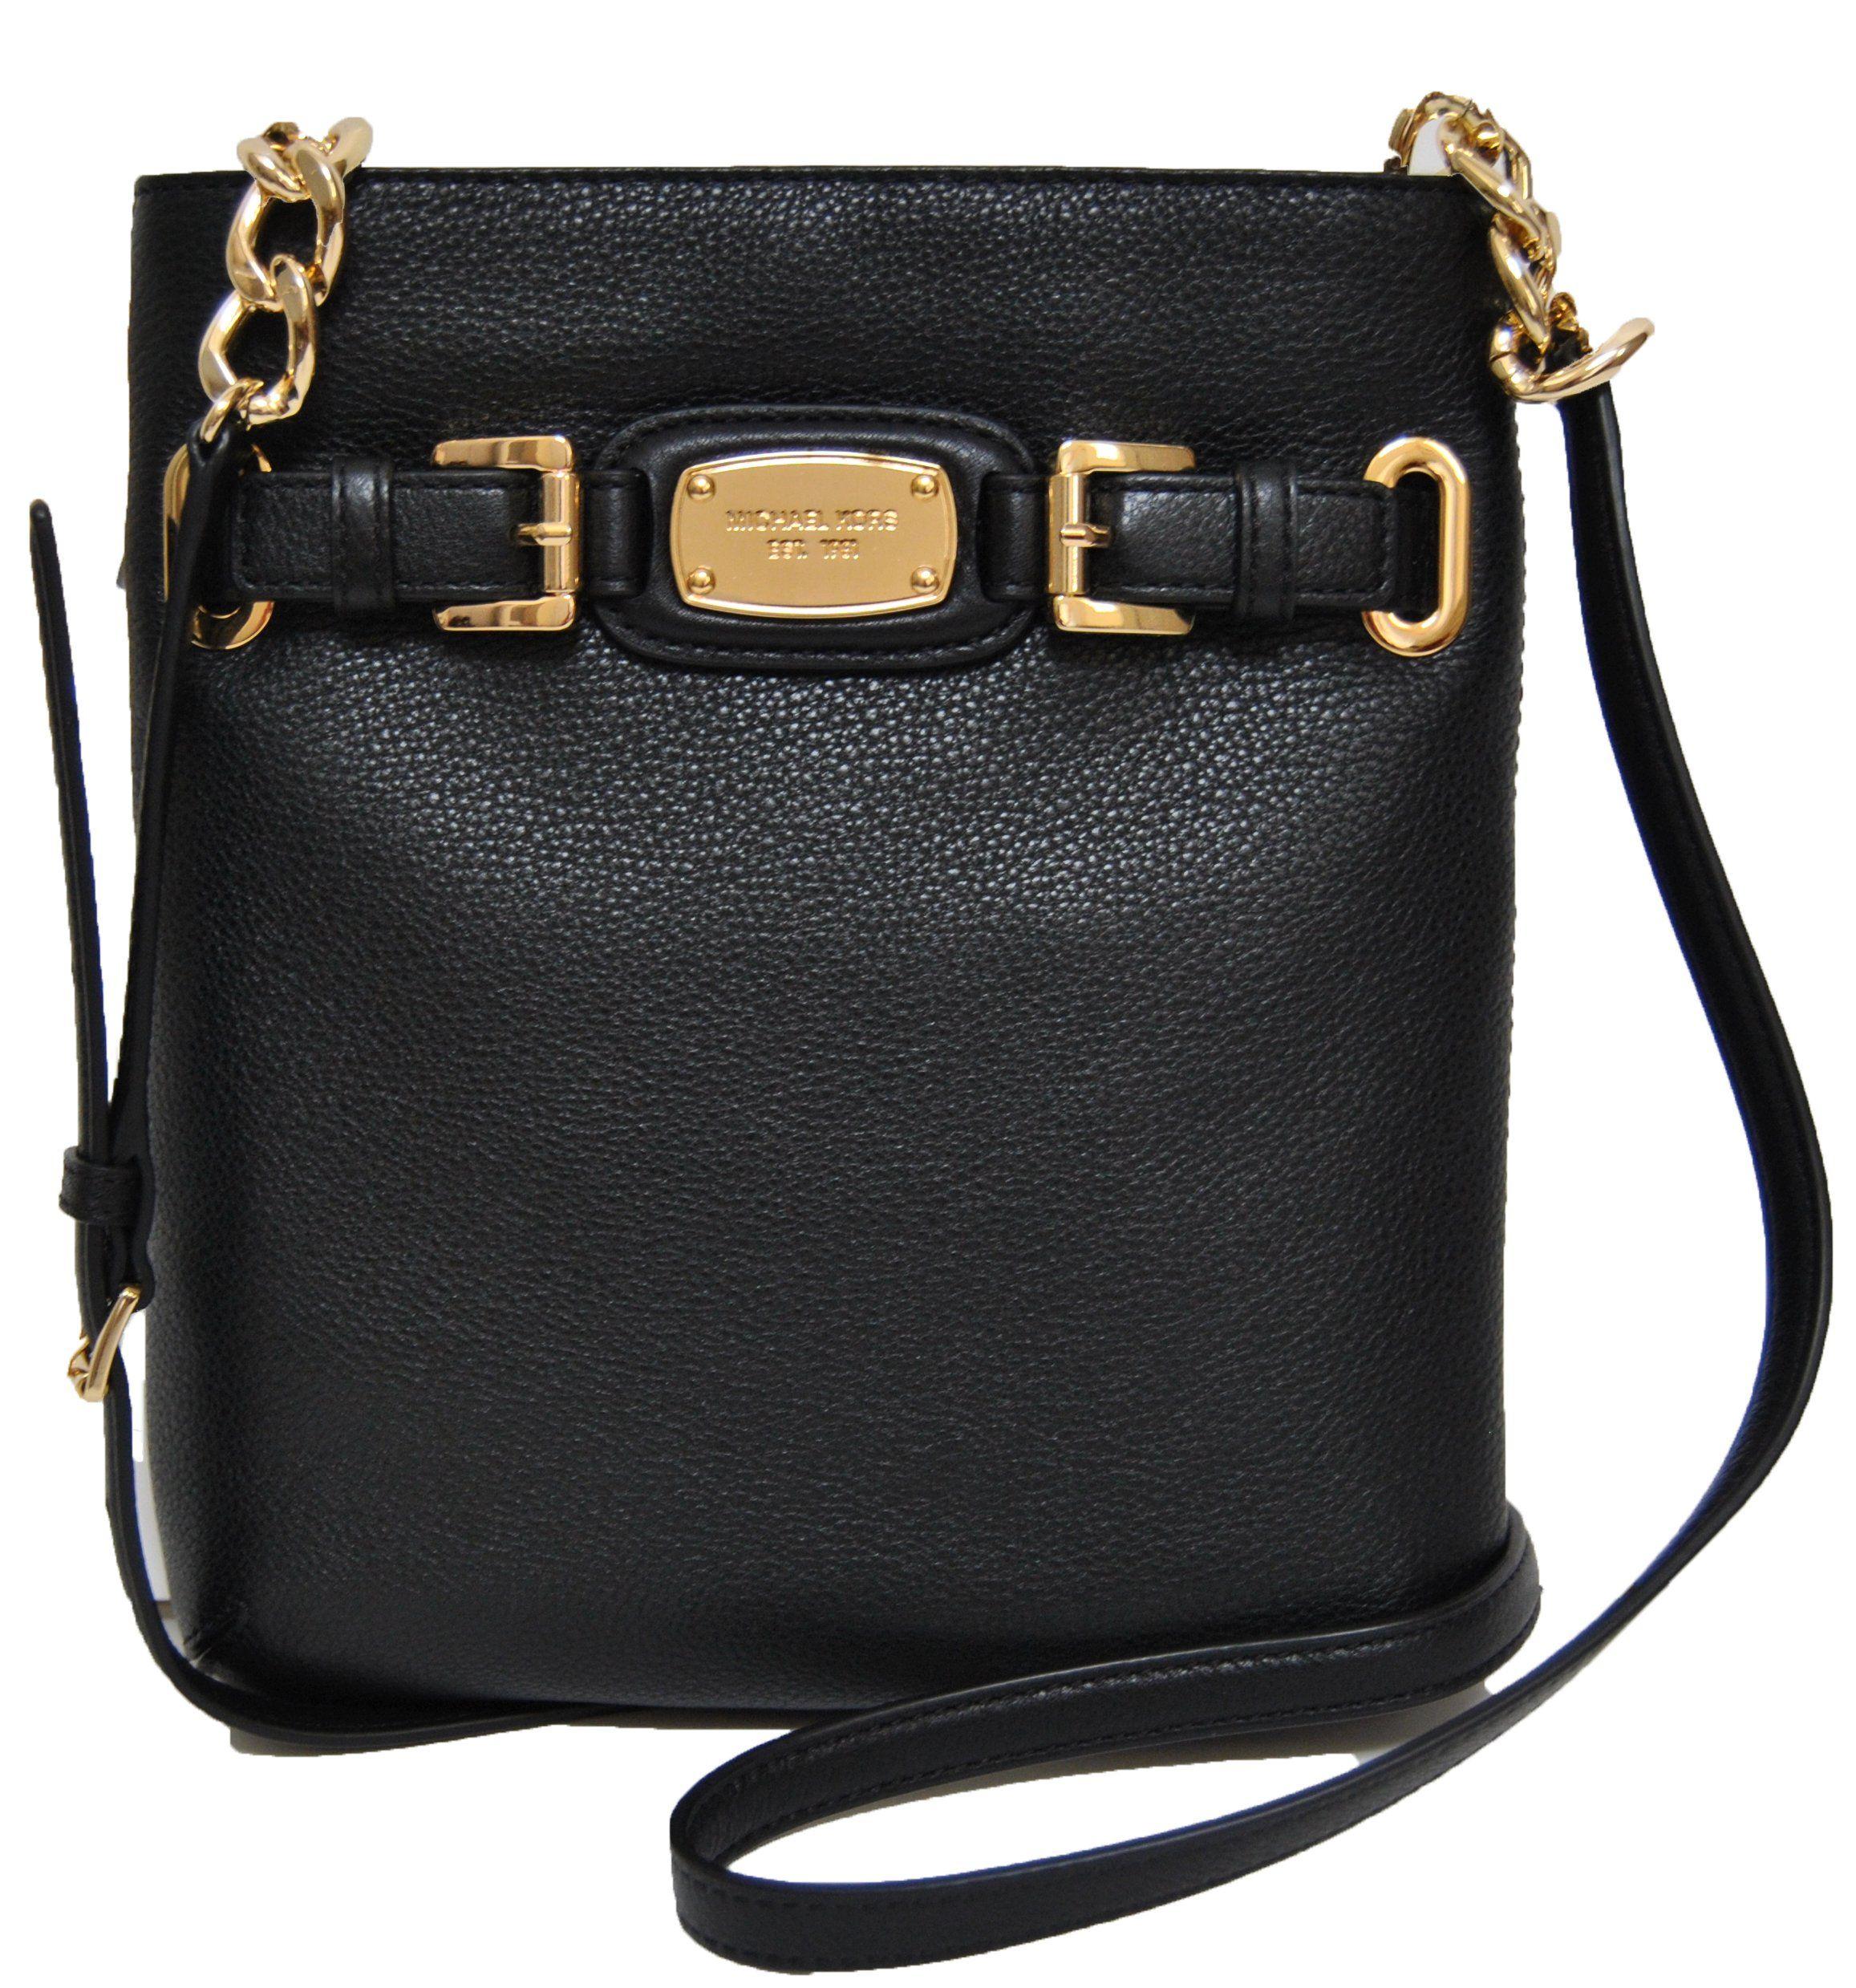 Michael Kors Hamilton Large Crossbody Black Leather: Handbags: Amazon.com